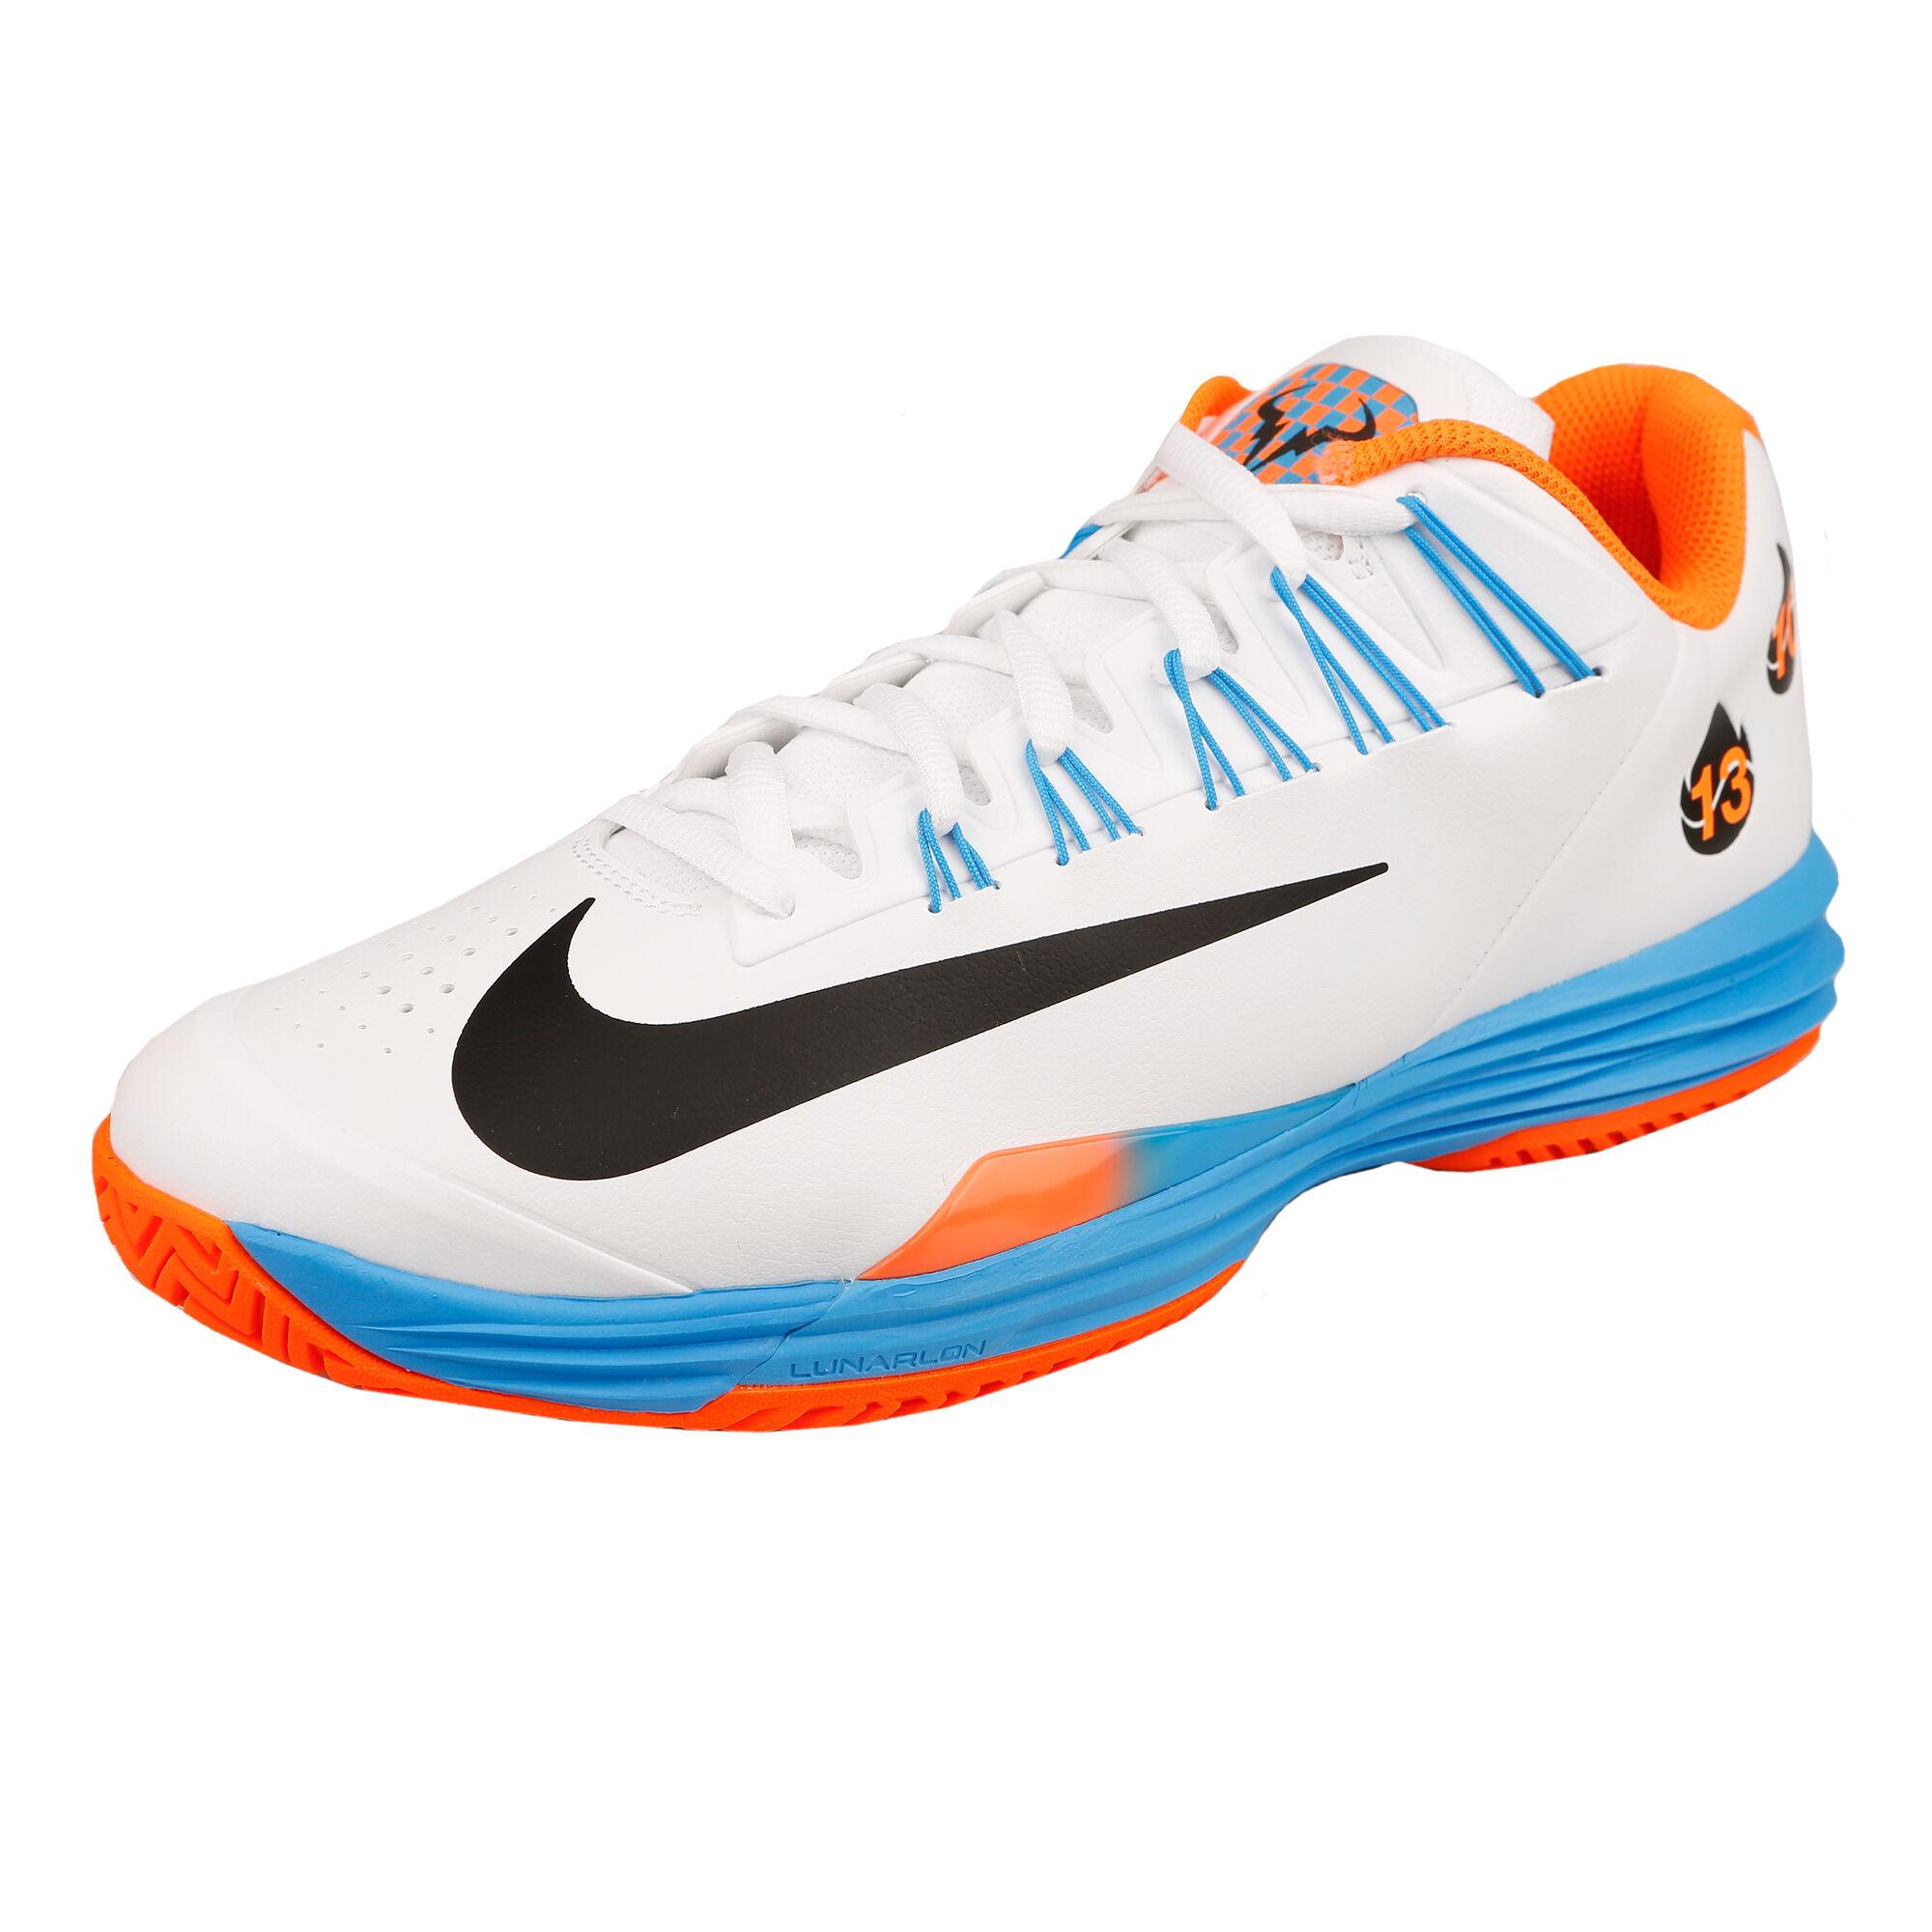 0c7045b400 Nike Rafael Nadal Lunar Ballistec 1.5 LG Zapatilla Todas Las ...